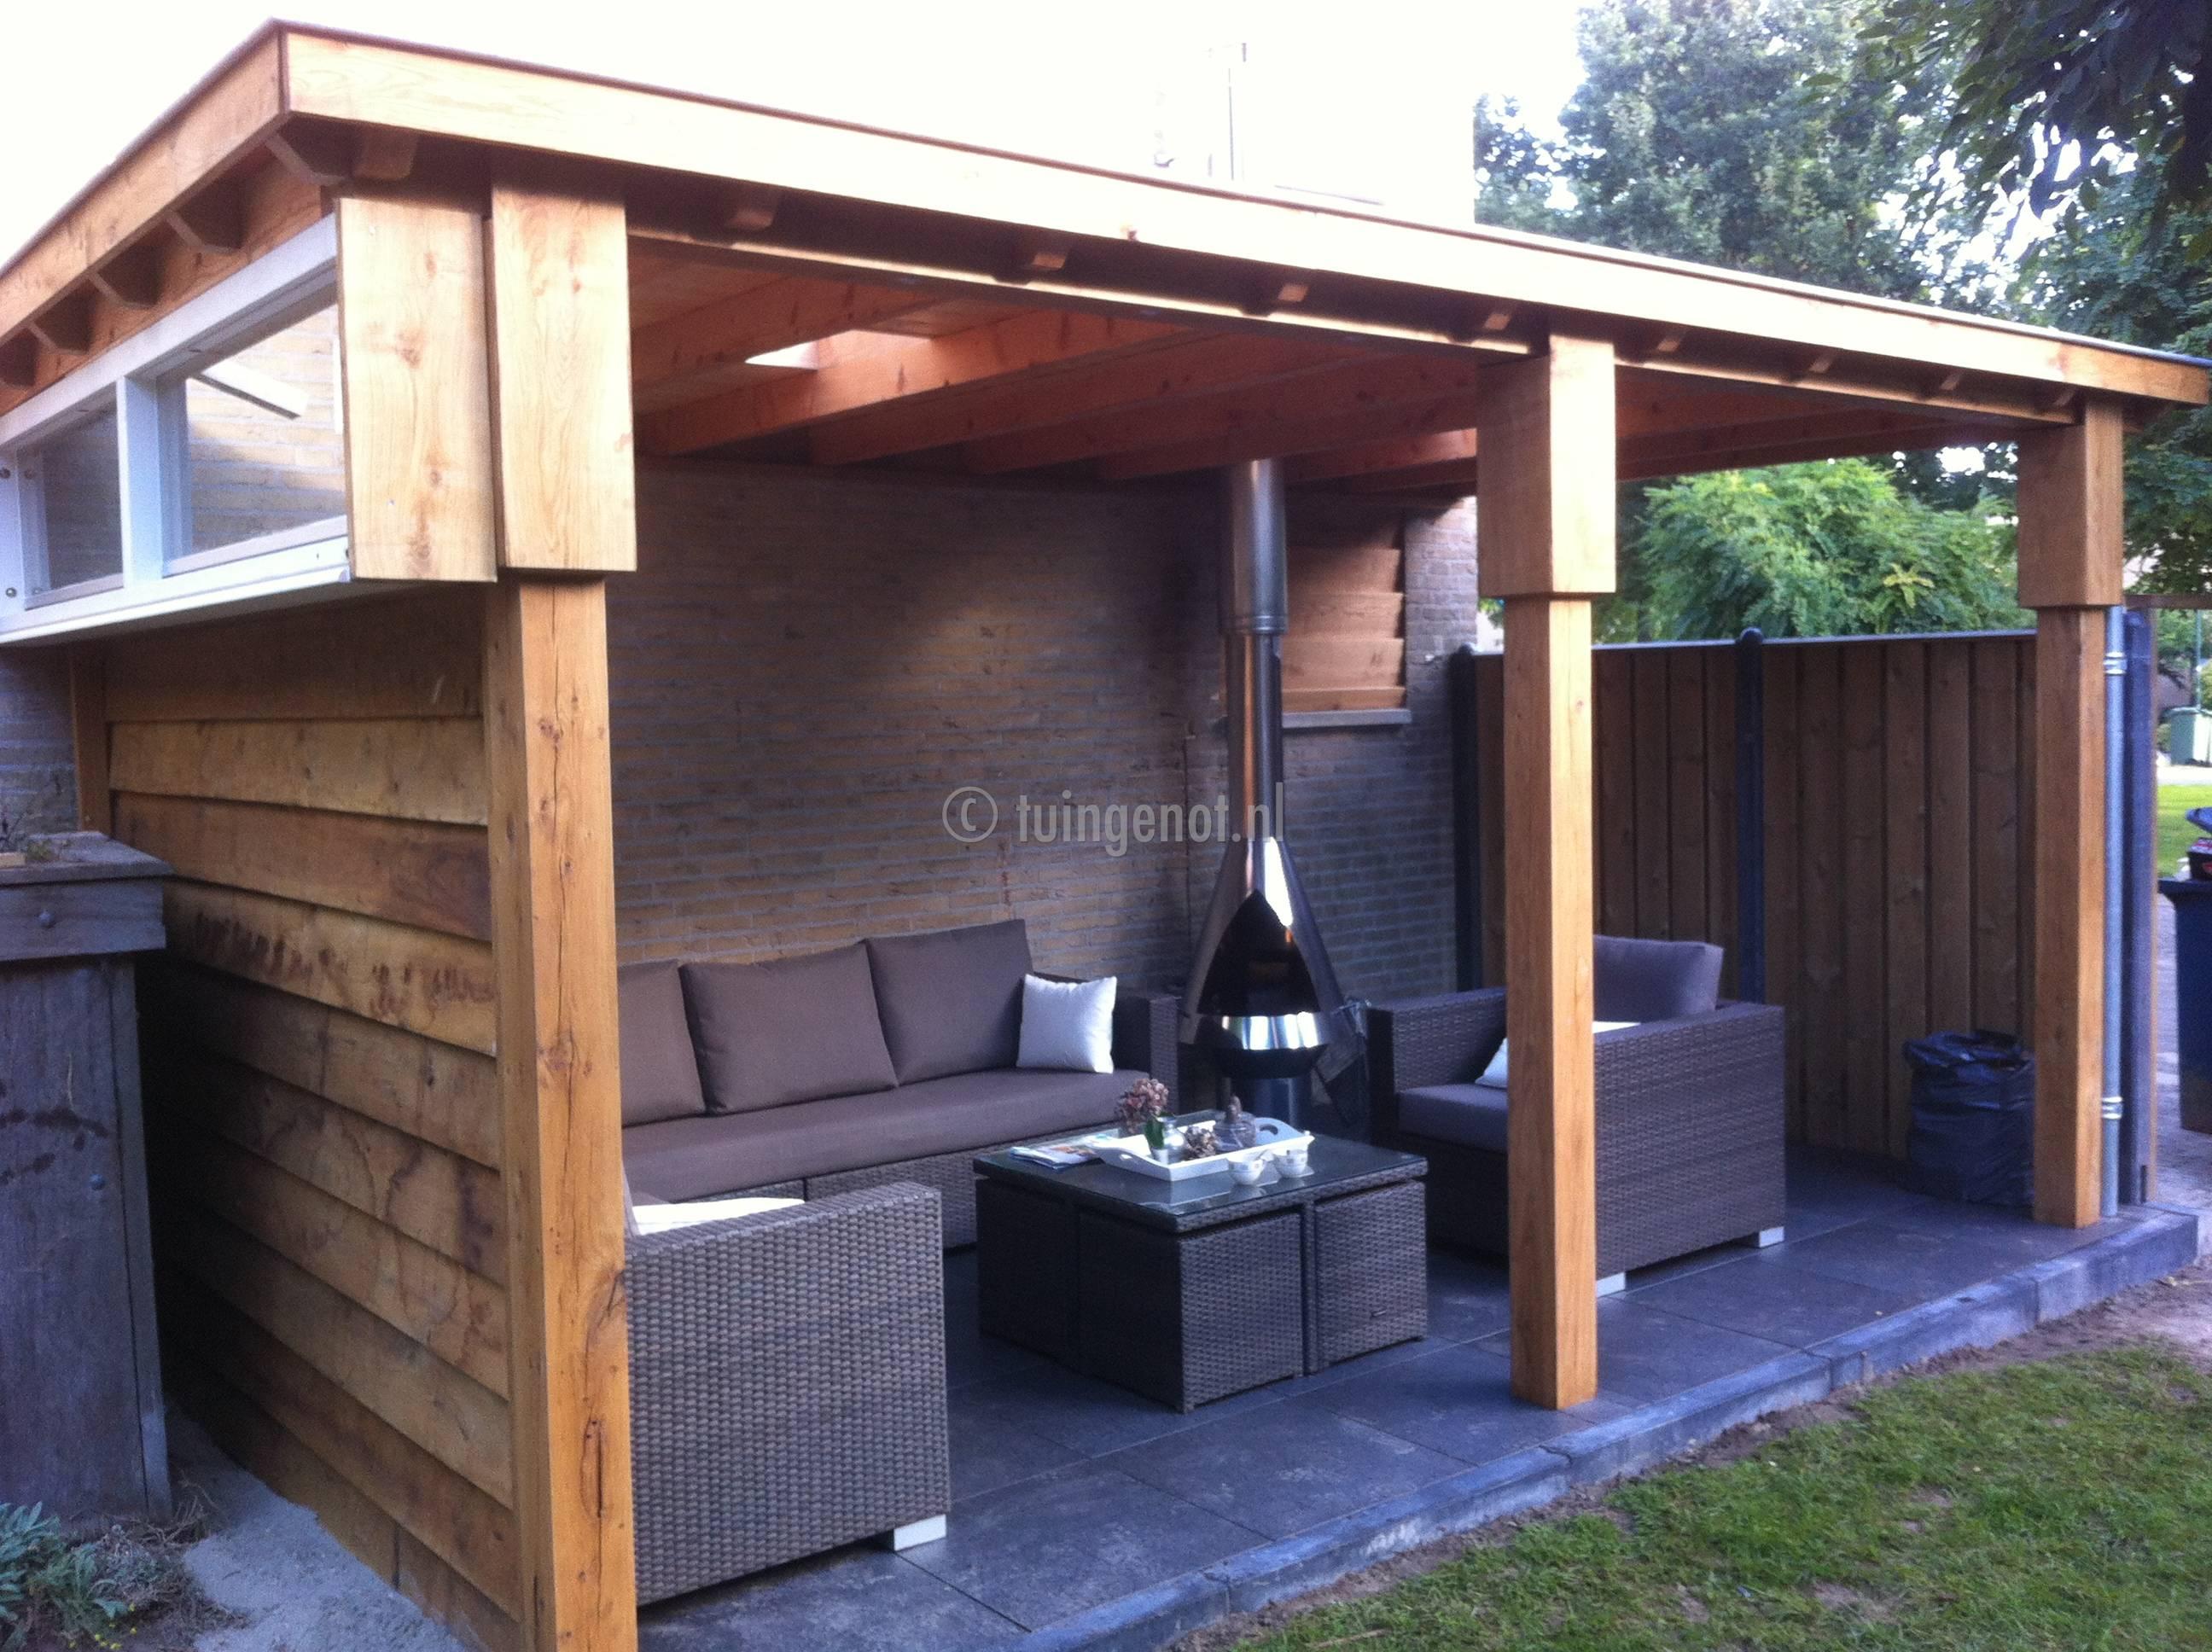 http://www.tuingenot.nl/assets/galleries/105/veranda_eiken_houten.jpg